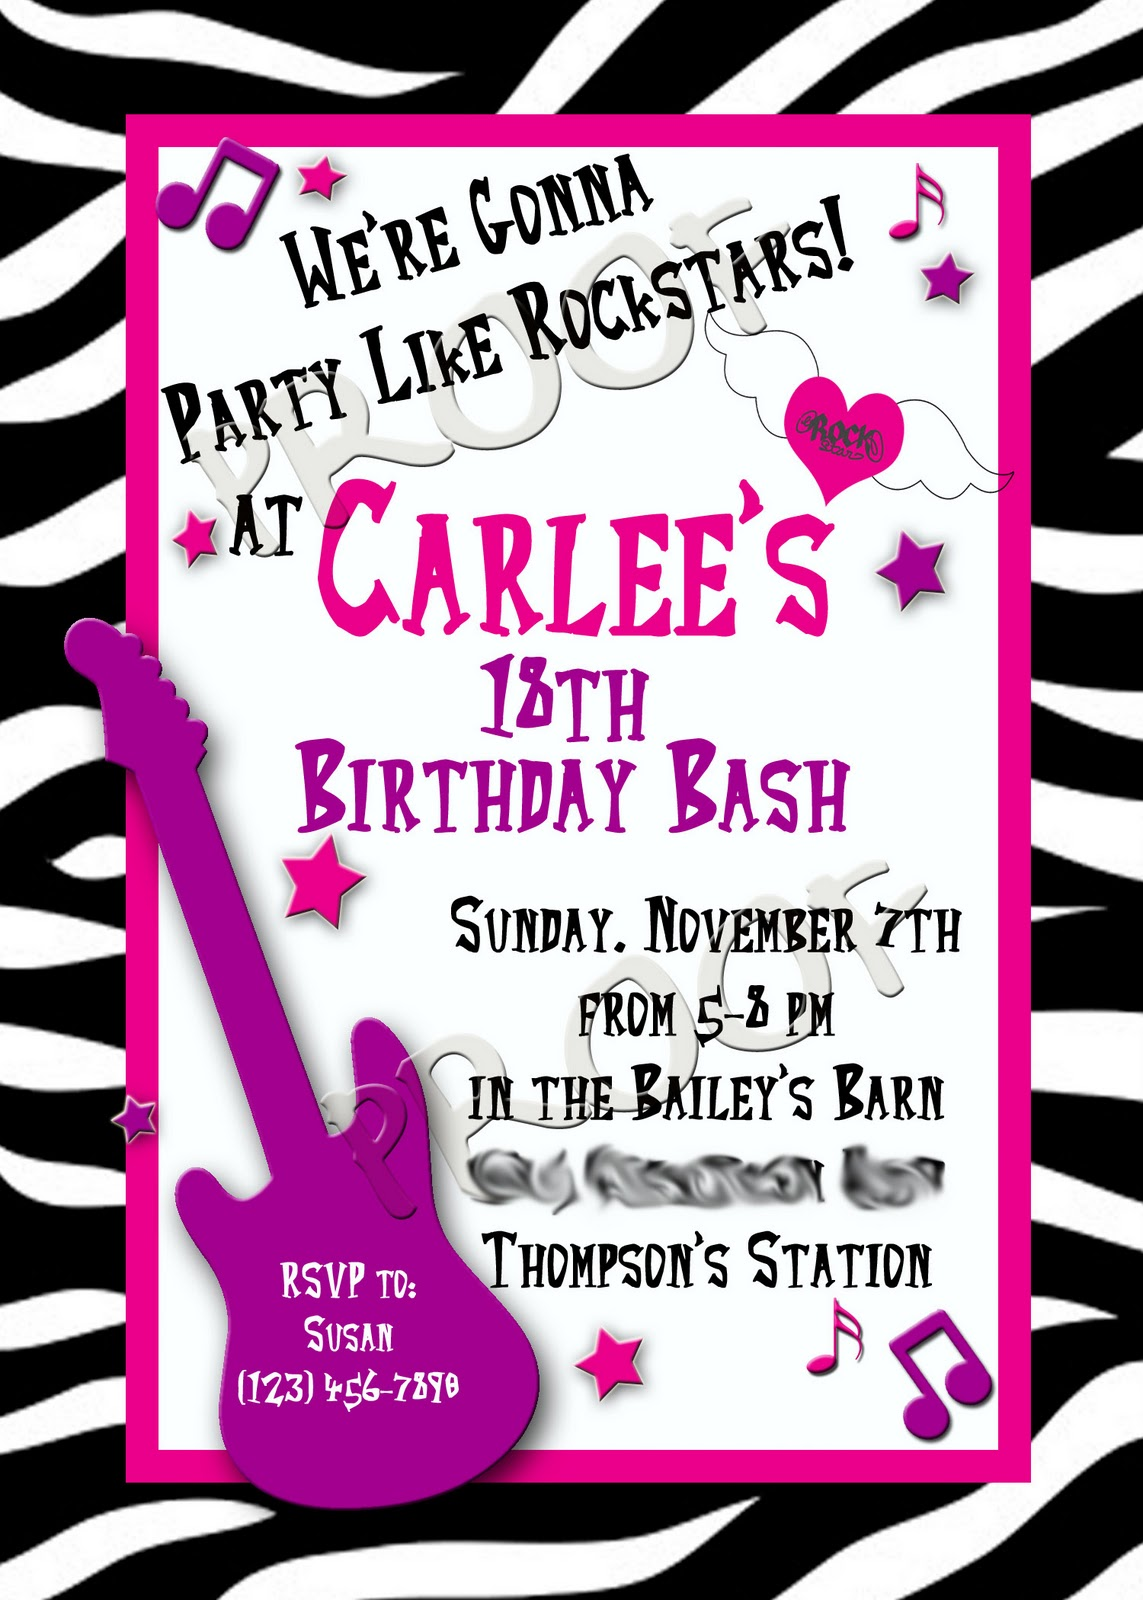 Fanci Prints by Tiffany RockStar Party Invitation – Rockstar Party Invites